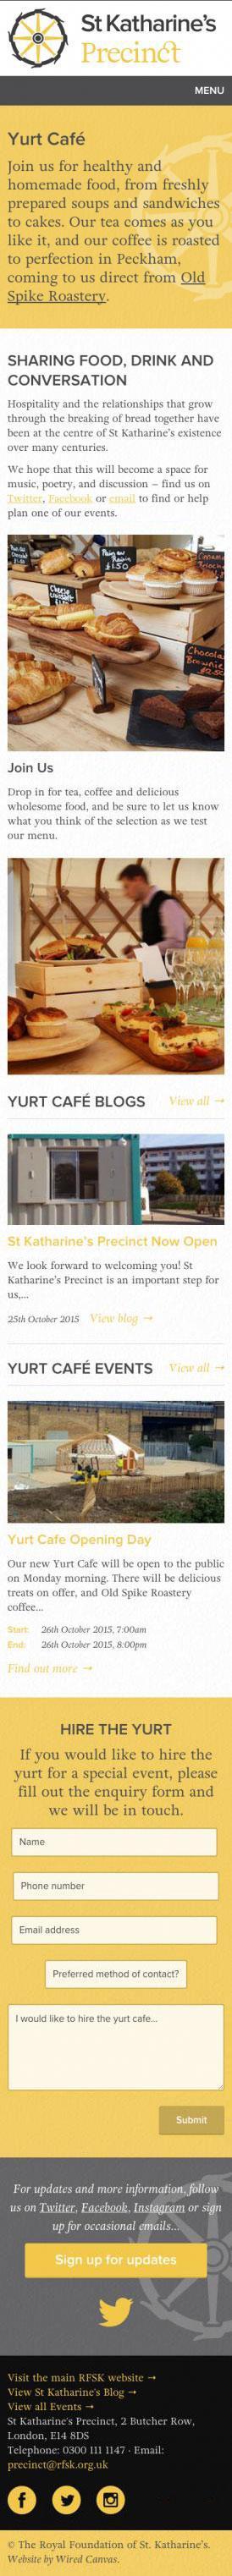 St Katharine's Precinct Mobile Website Design